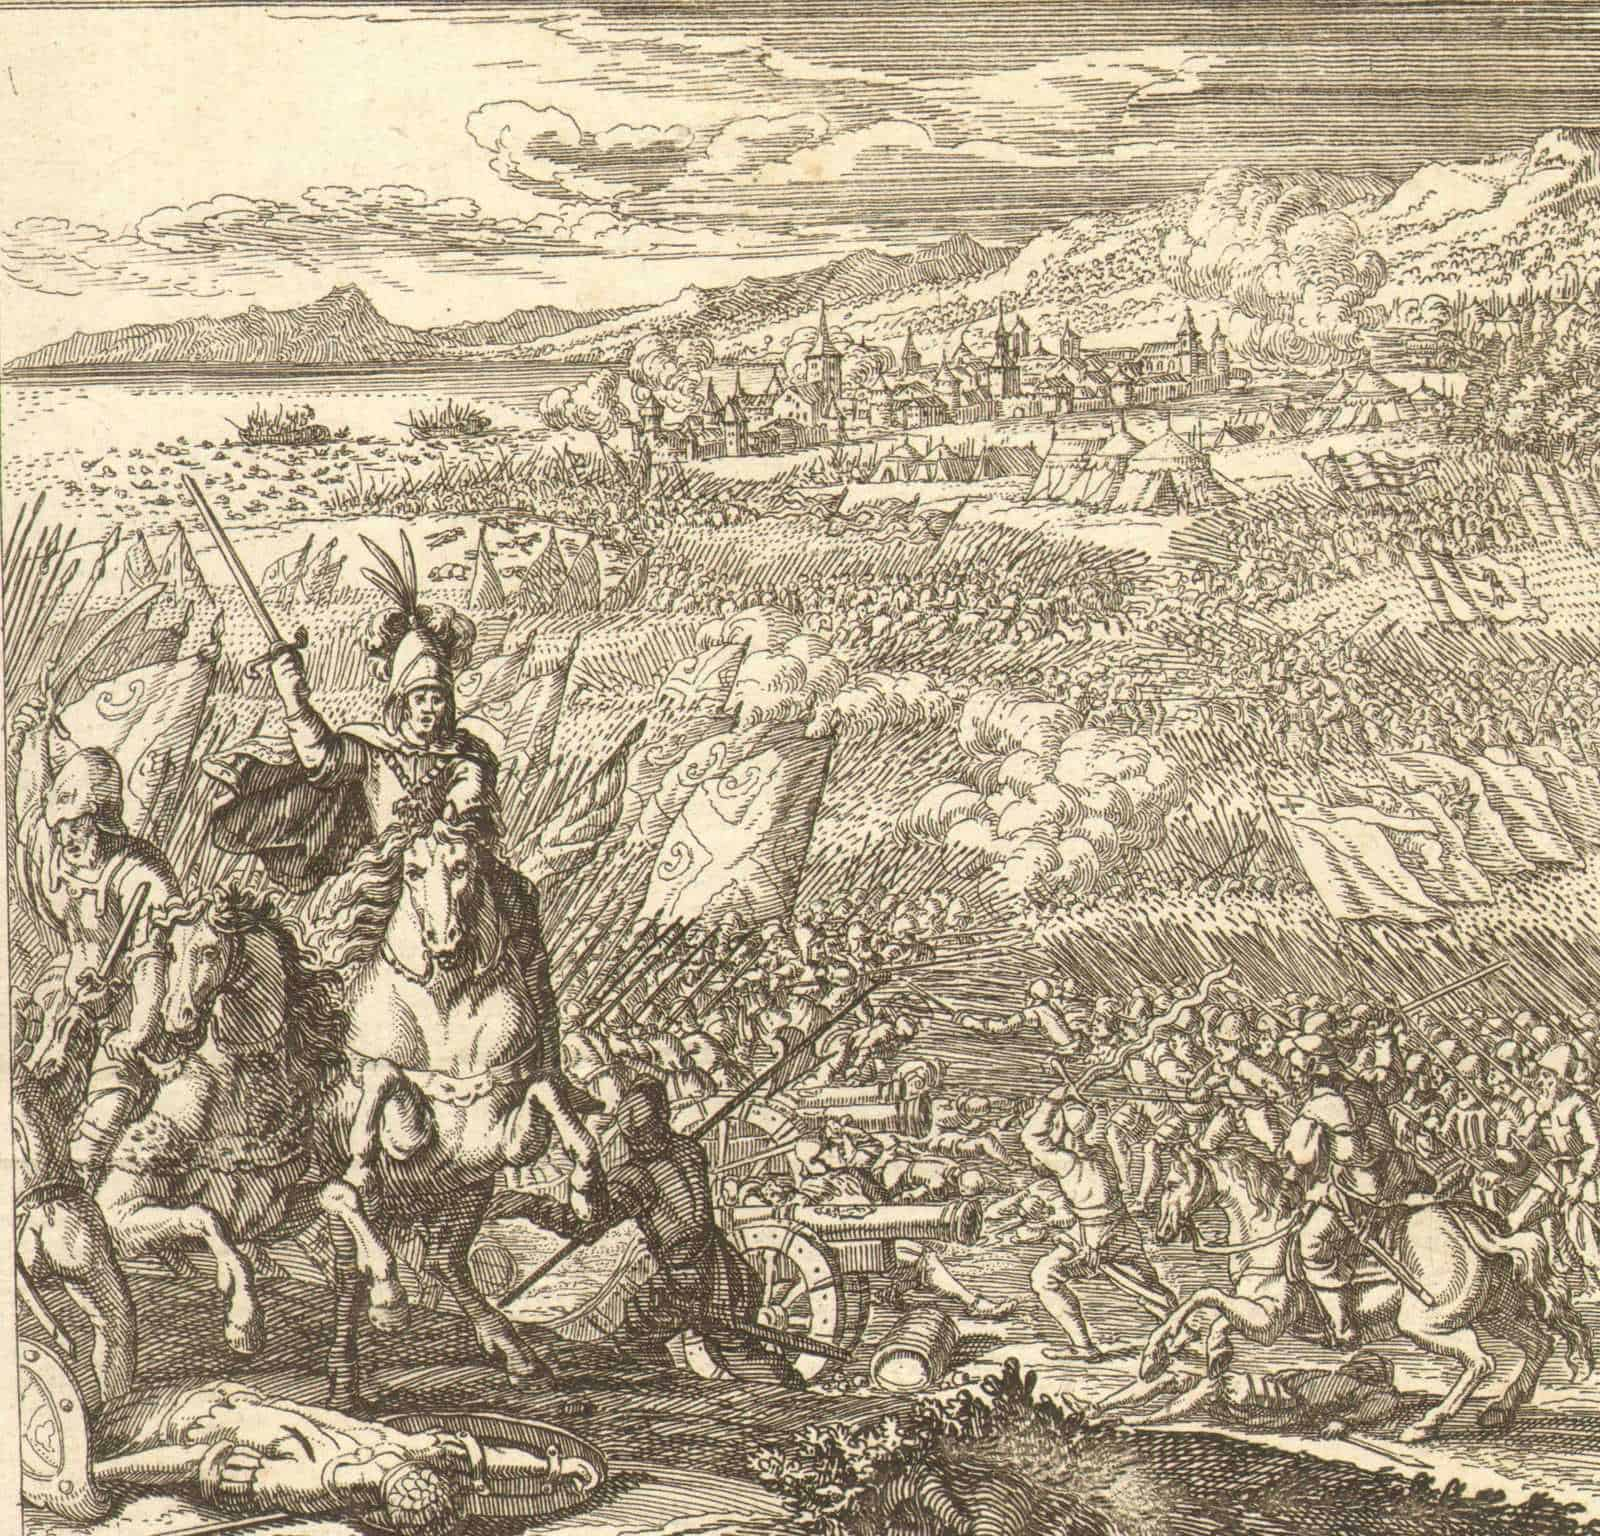 1685-Original-Single-leaf-Switzerland-Battle-of-Murten-Bern-Johannes-Meyer-401294868489